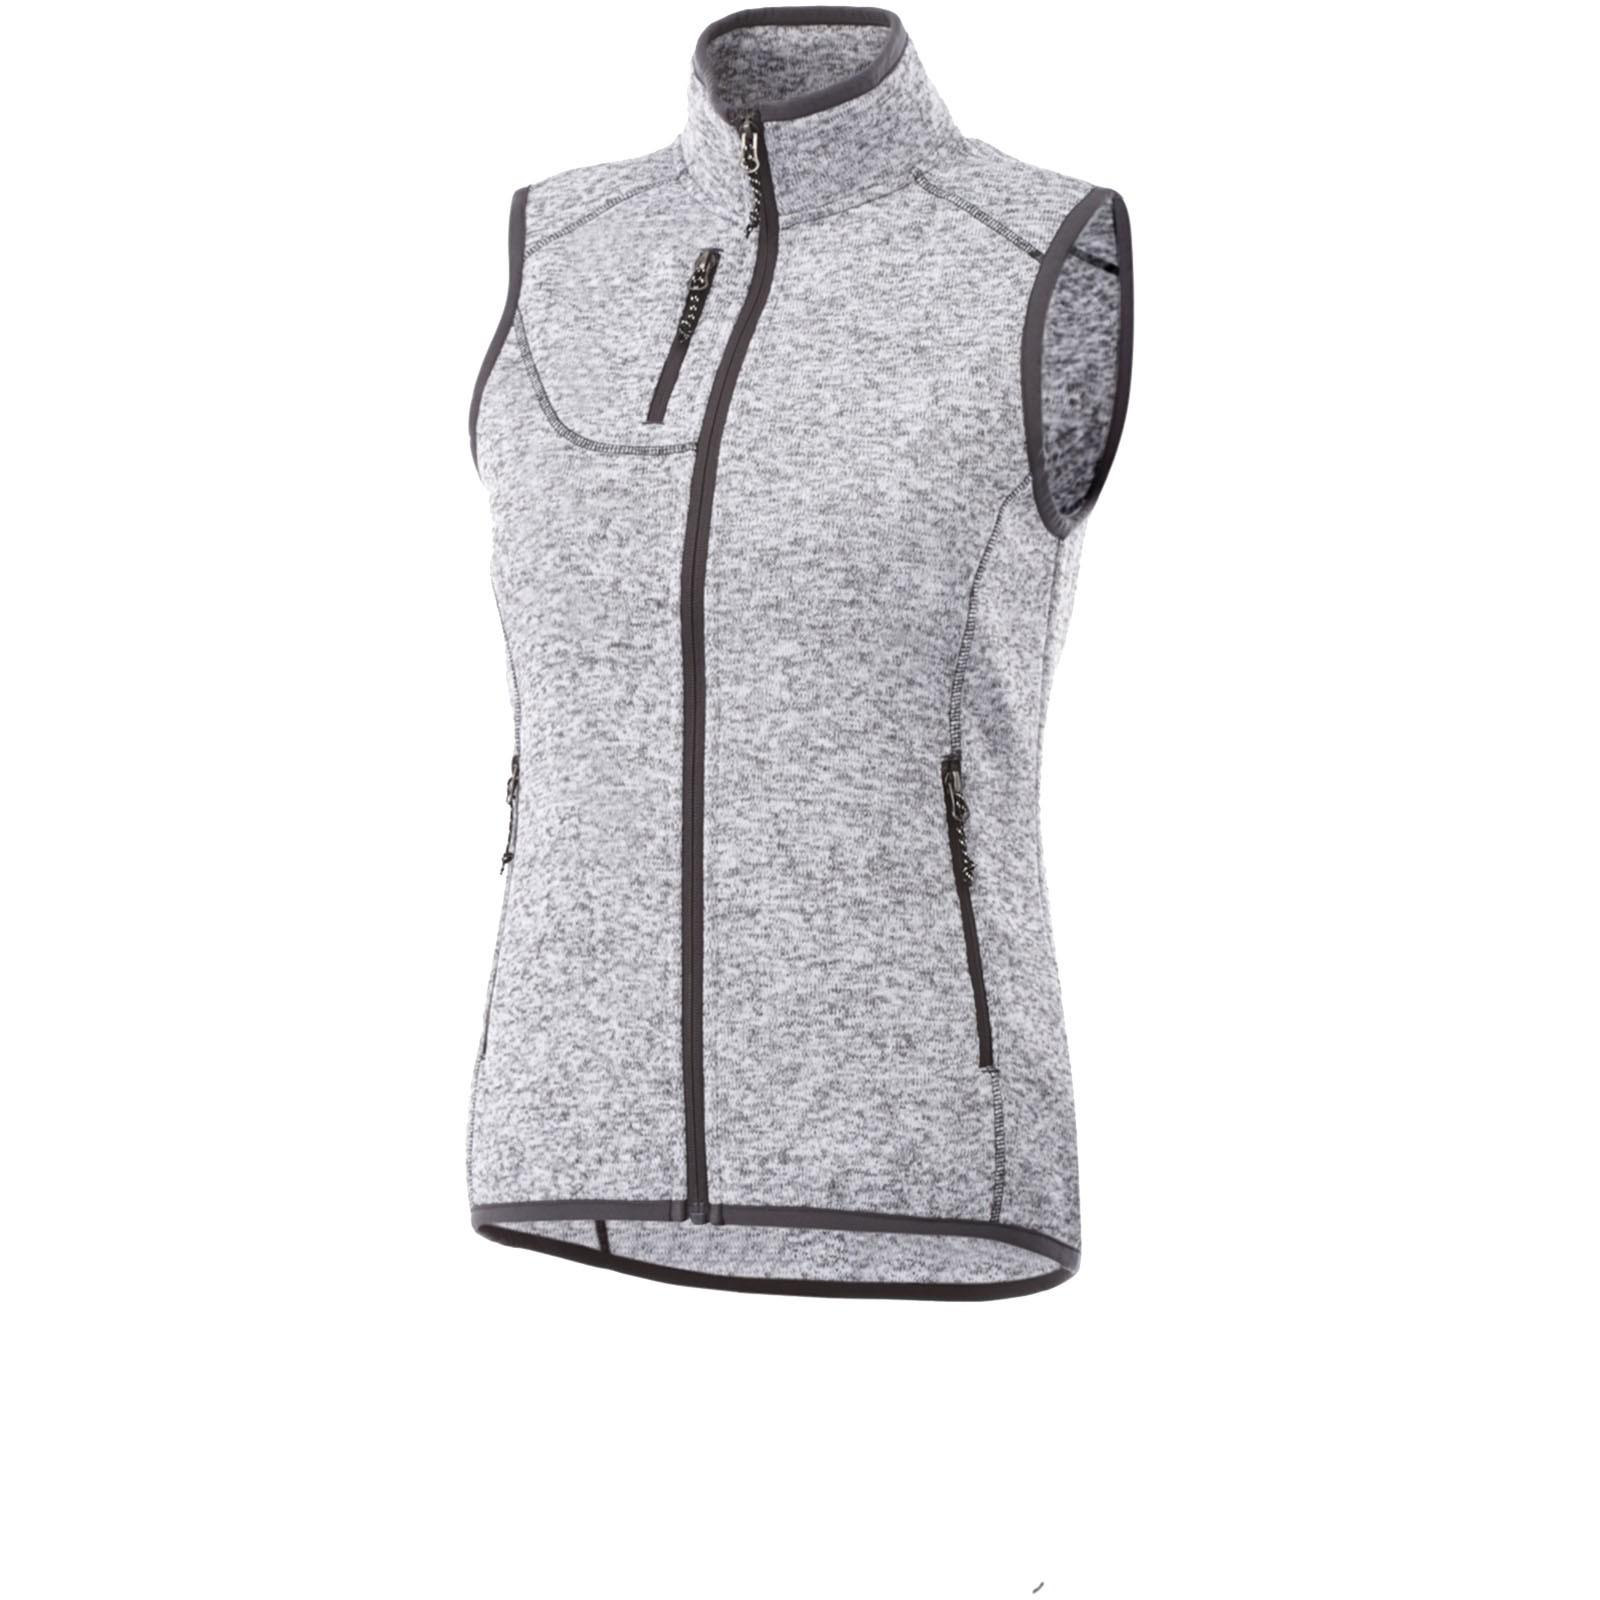 Fontaine ladies knit bodywarmer - Heather Grey / M